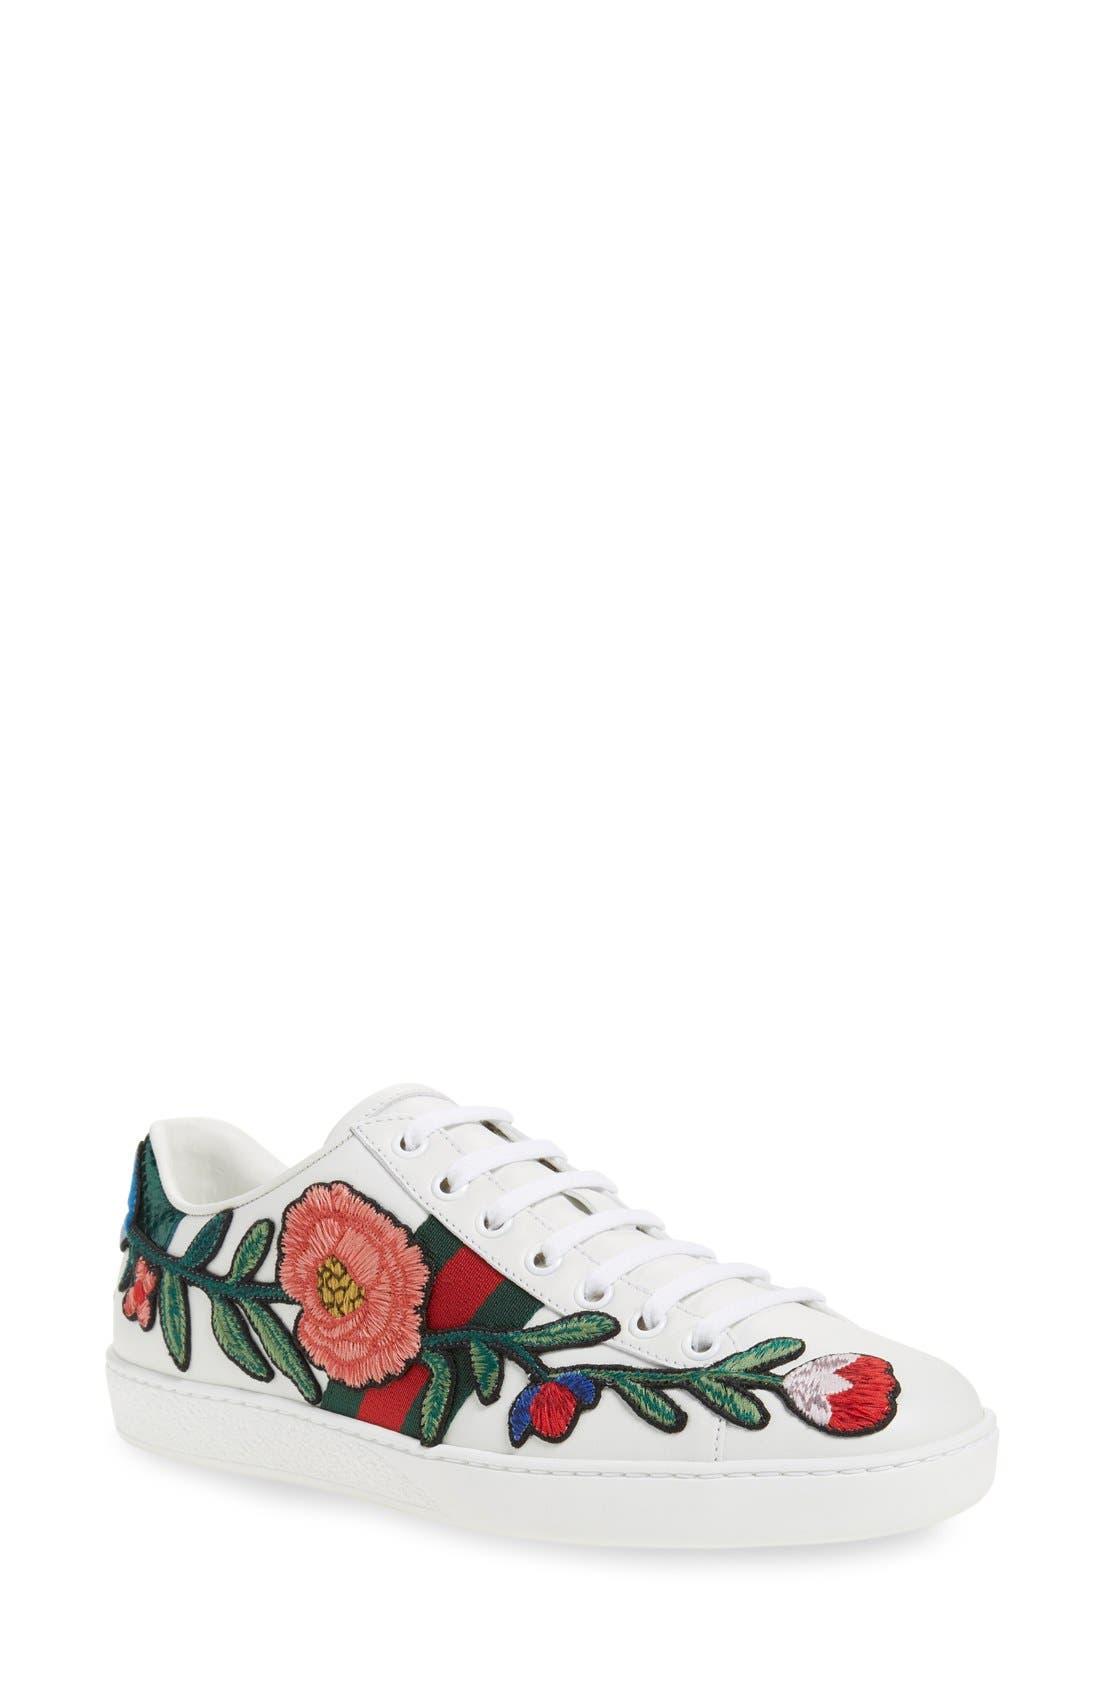 Gucci 'New Ace' Low Top Sneaker (Women)